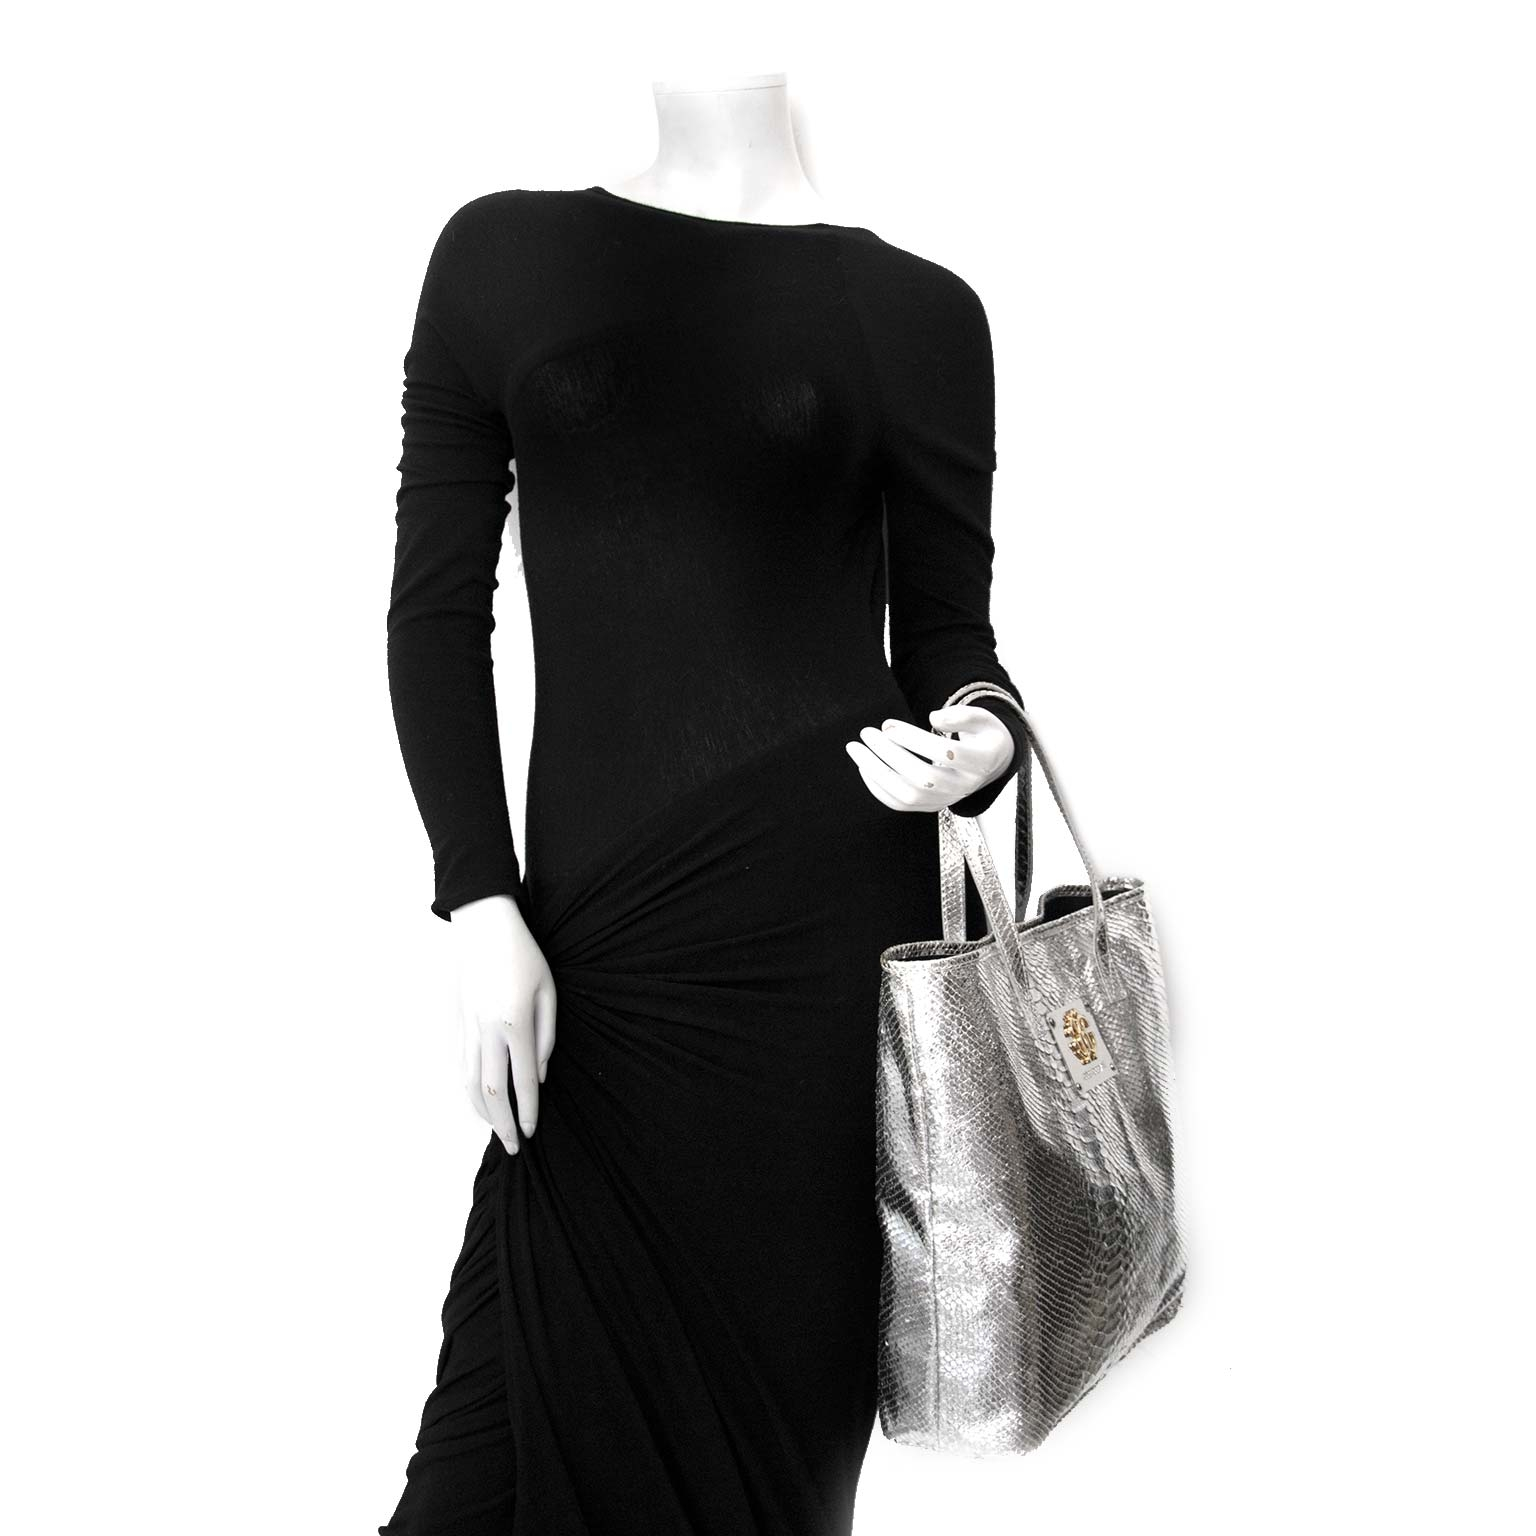 Roberto Cavalli Silver Python Bag Buy authentic designer Roberto Cavalli secondhand bags at Labellov at the best price. Safe and secure shopping. Koop tweedehands authentieke Roberto Cavalli tassen bij designer webwinkel labellov.